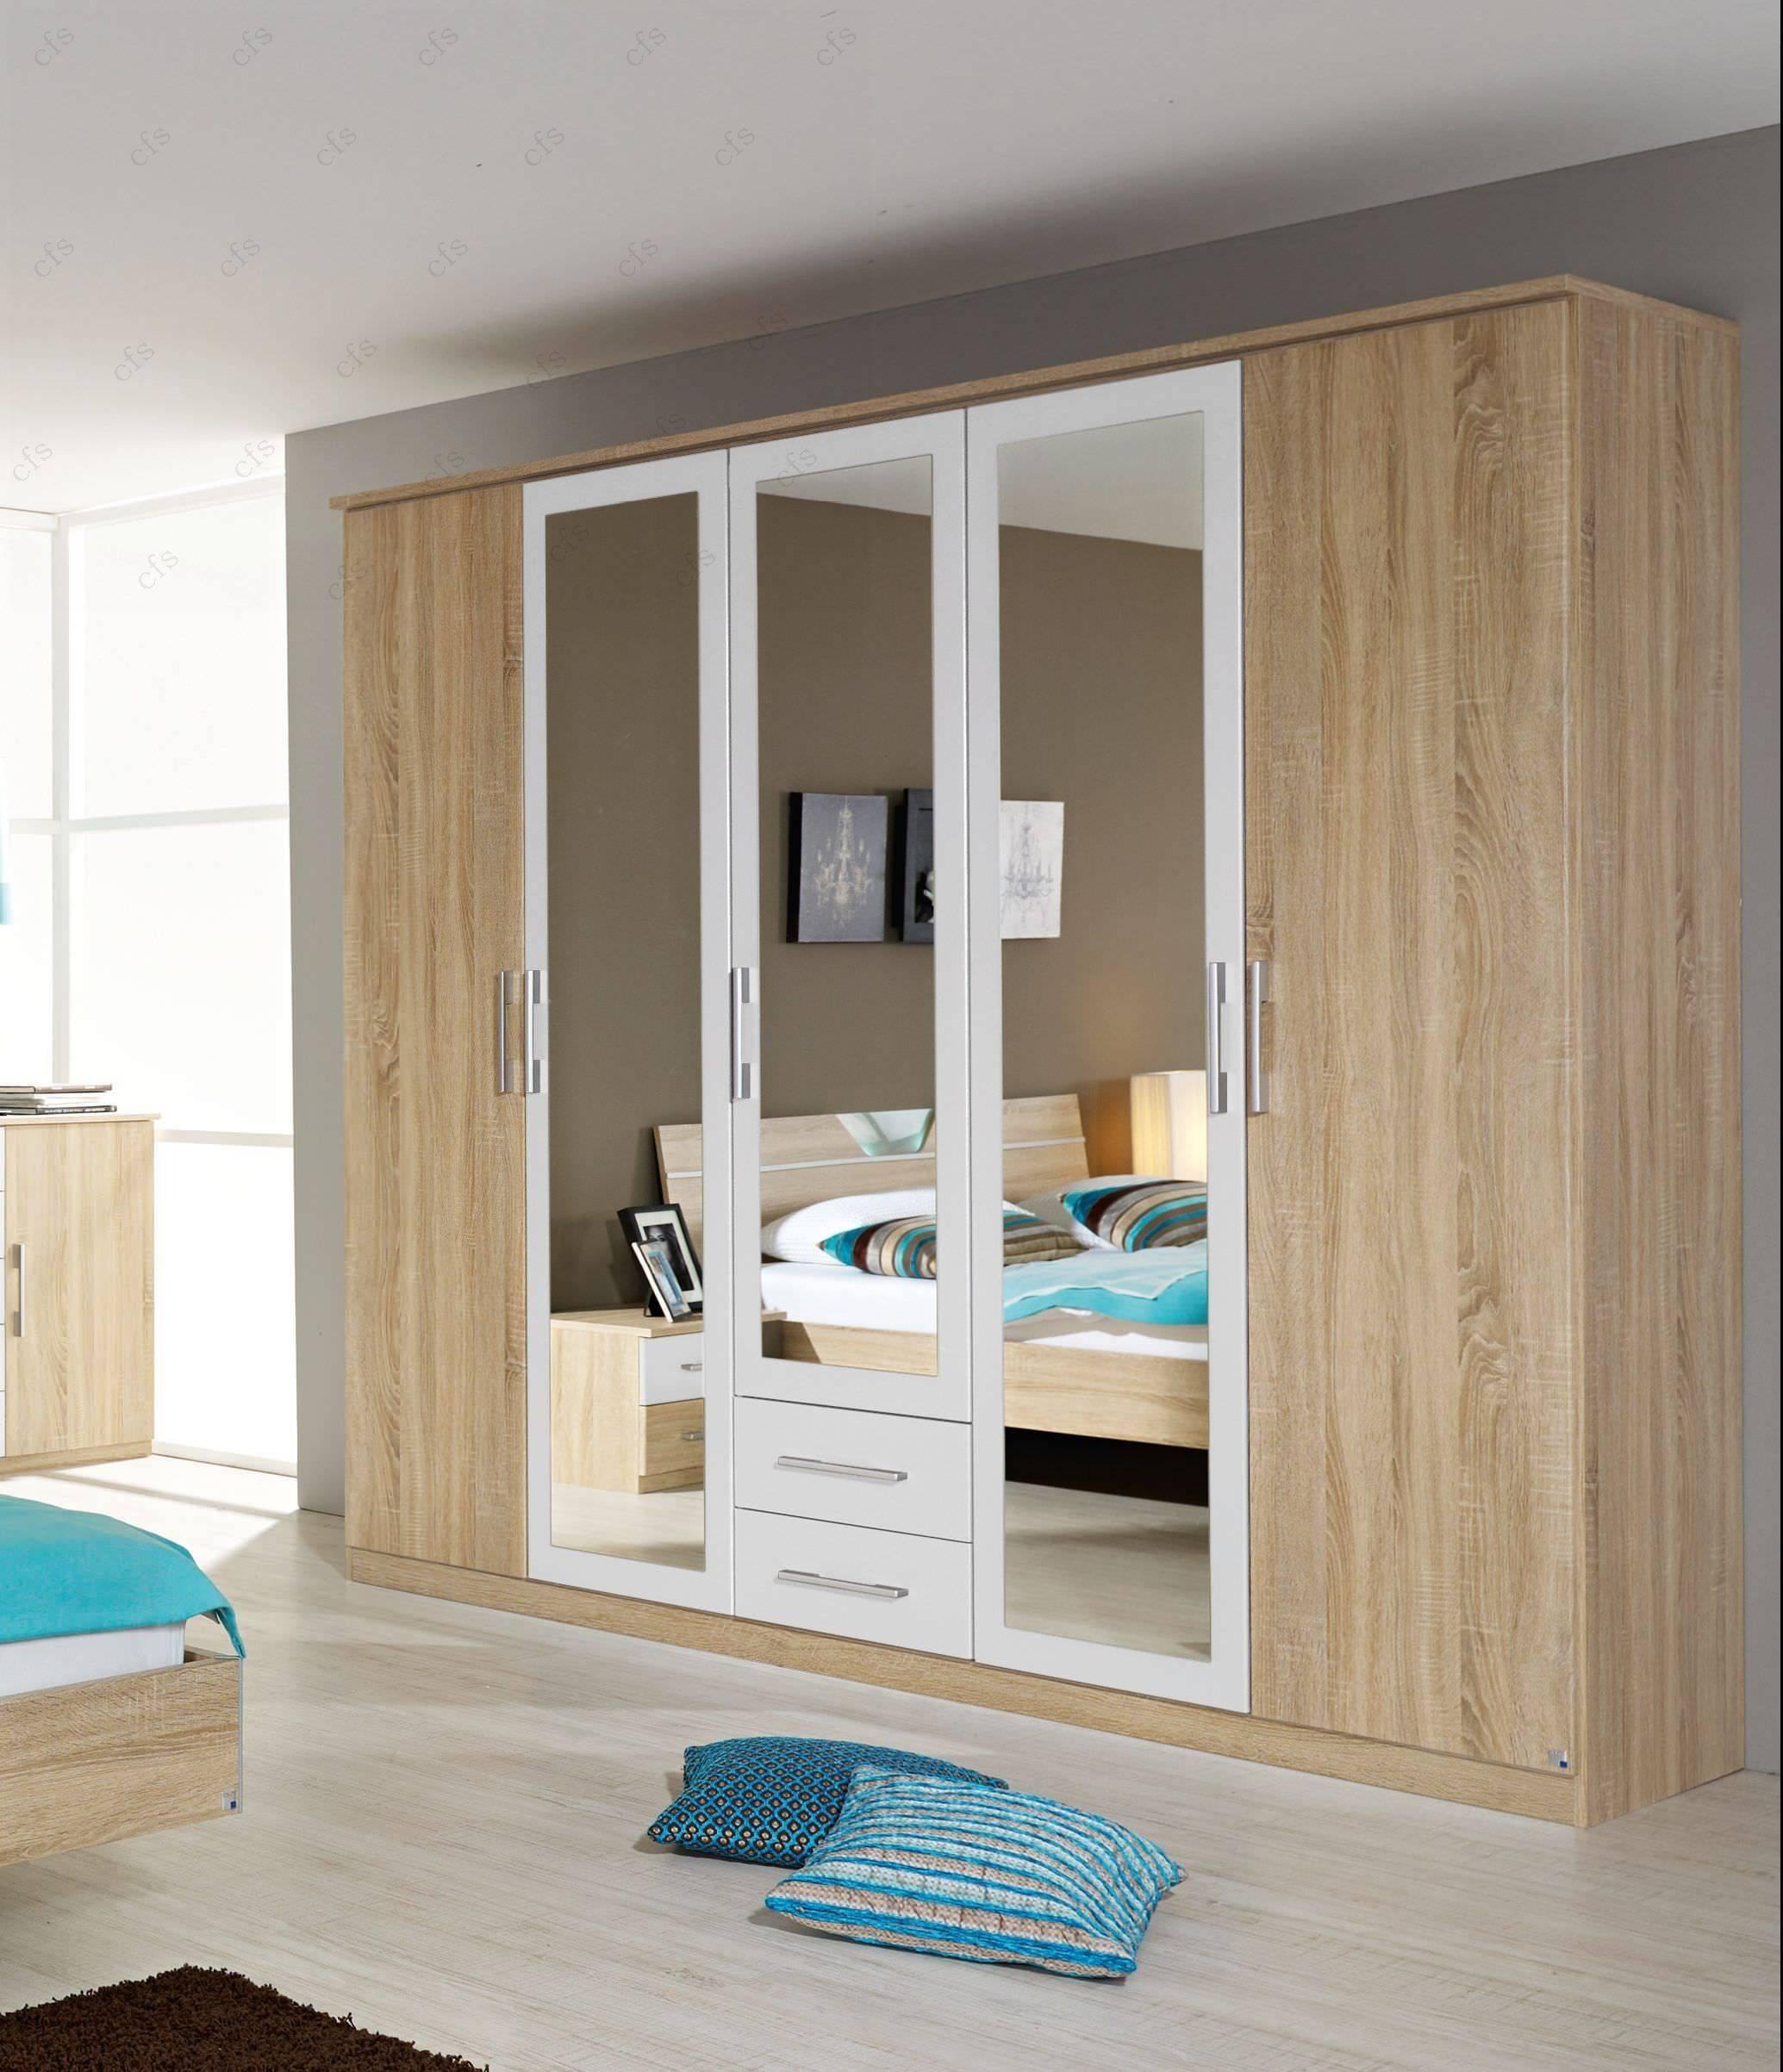 Rauch Furniture | Valence 5 Door Mirror Wardrobe | Bedsdirectuk Throughout 5 Door Wardrobes (View 2 of 15)